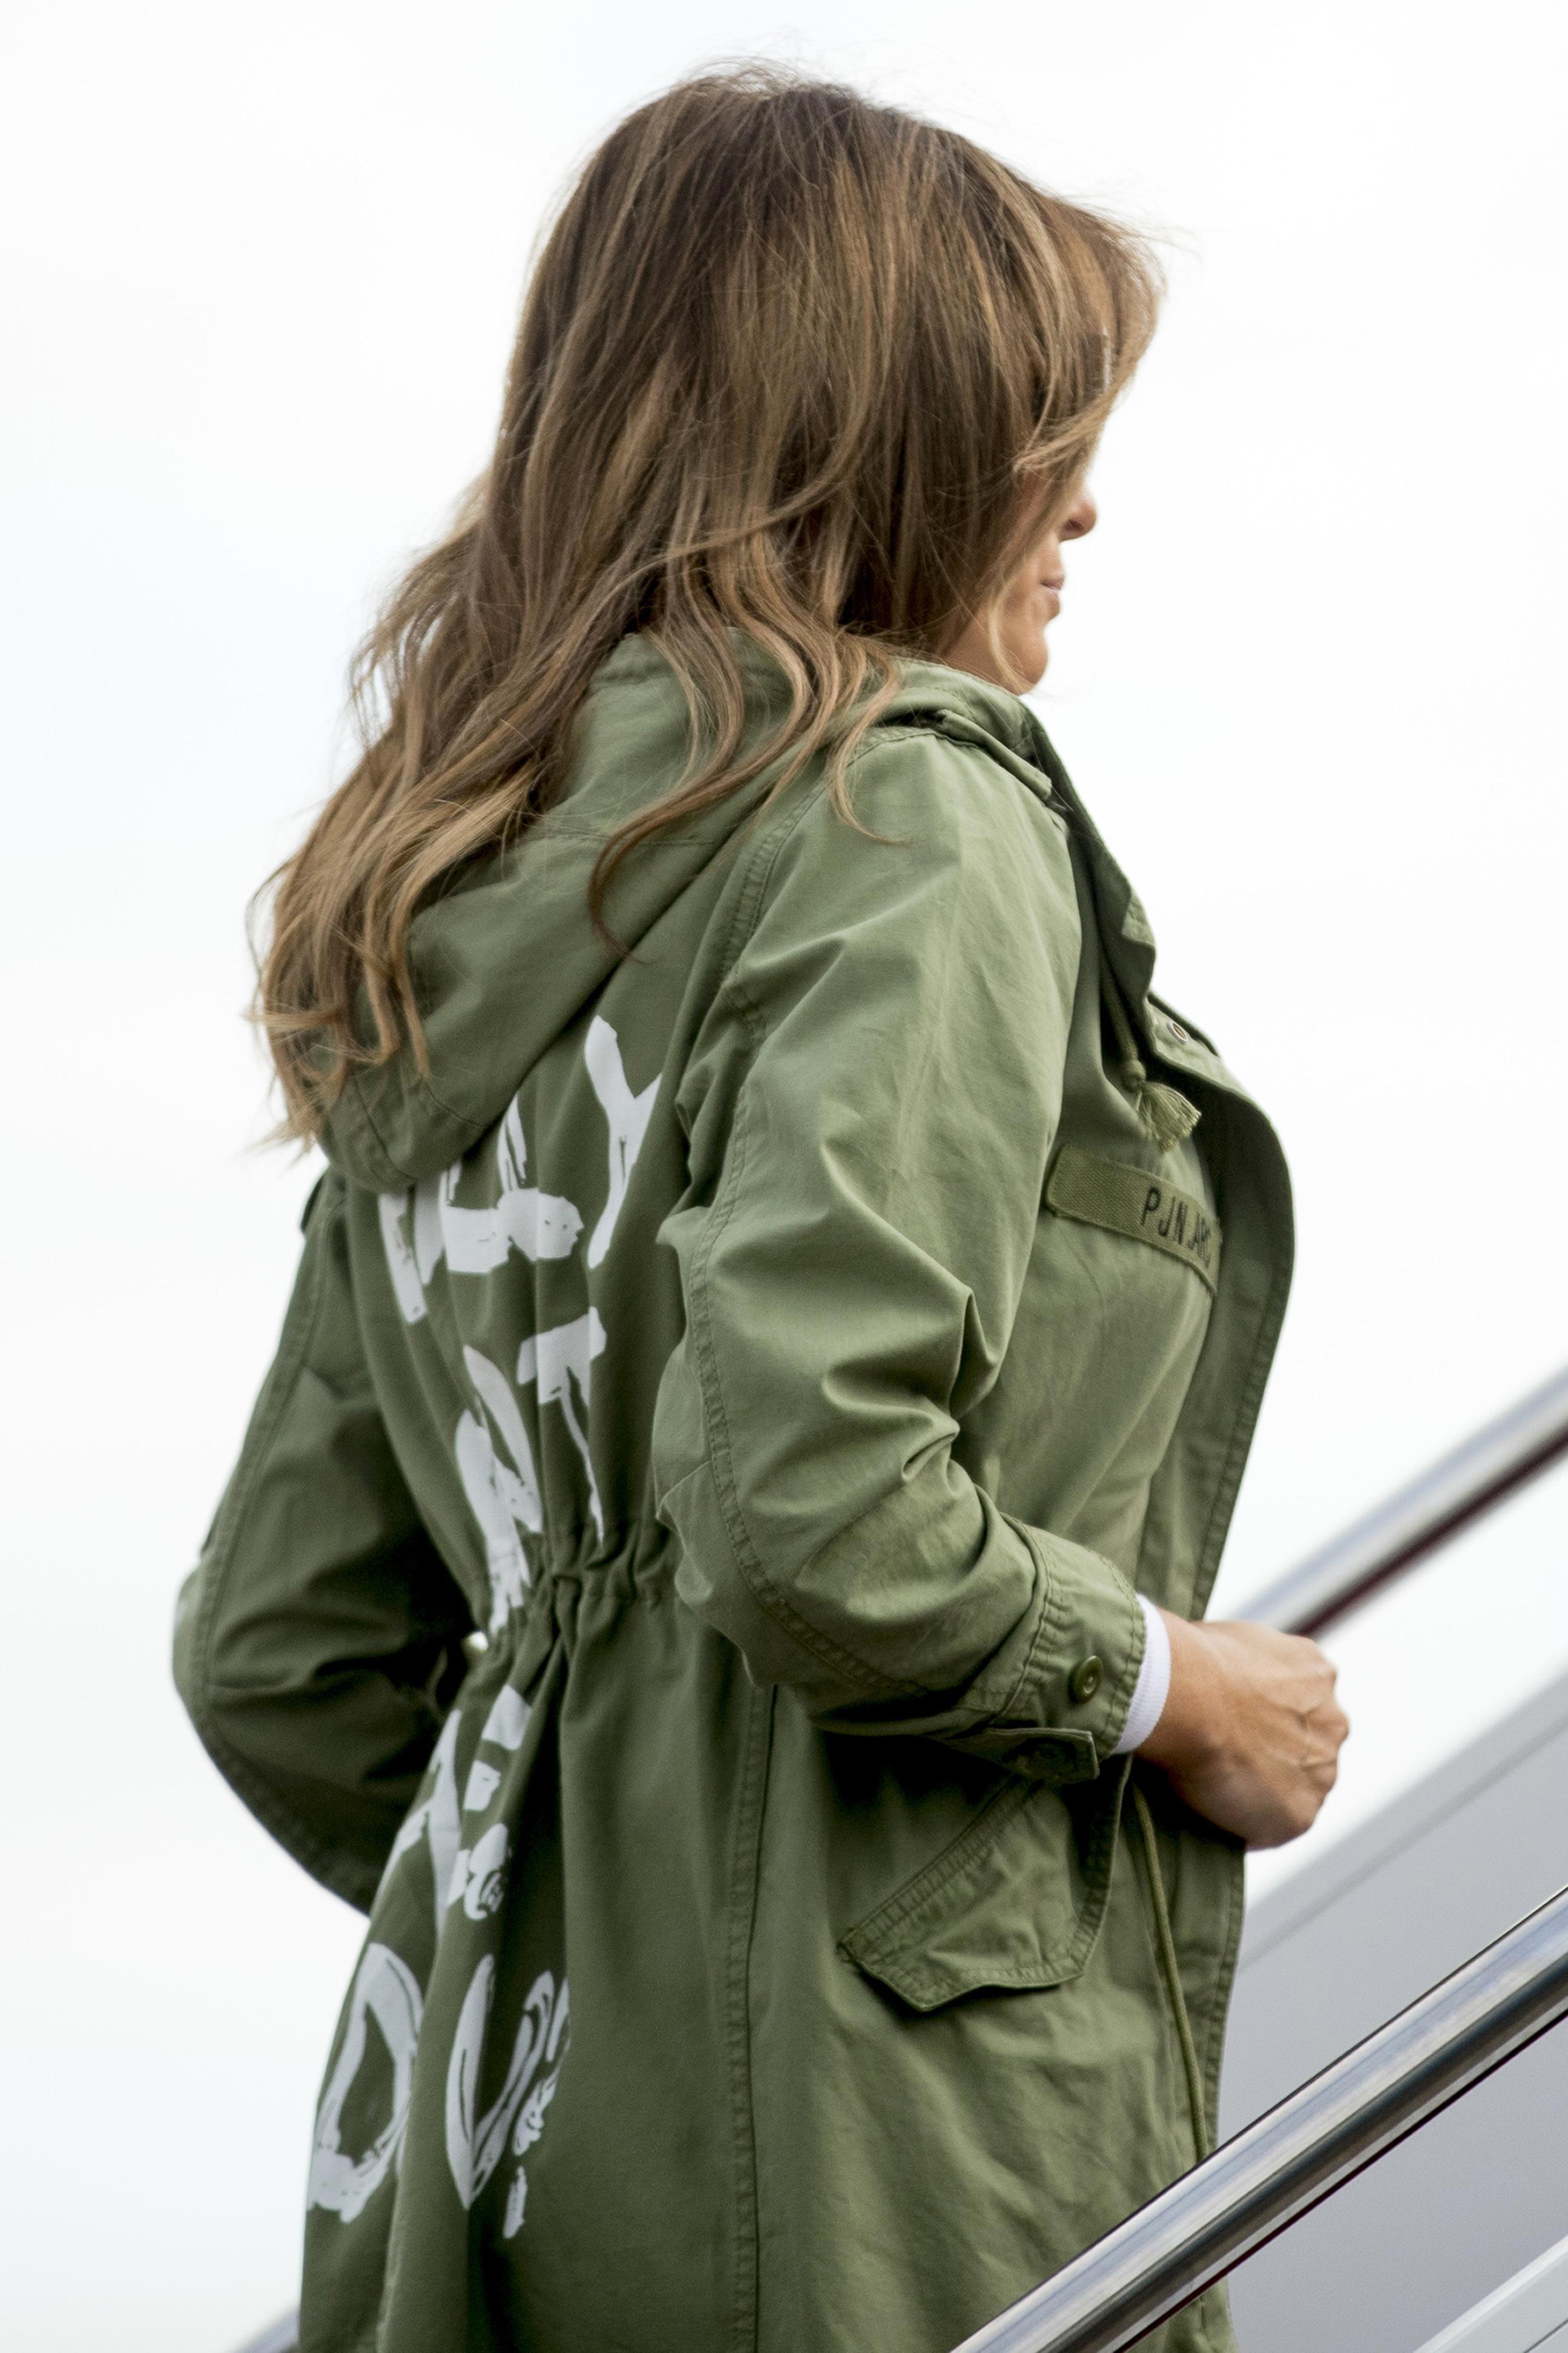 <div class='meta'><div class='origin-logo' data-origin='AP'></div><span class='caption-text' data-credit='AP'>First lady Melania Trump boards a plane at Andrews Air Force Base, Md., Thursday, June 21, 2018, to travel to Texas. (AP Photo/Andrew Harnik)</span></div>